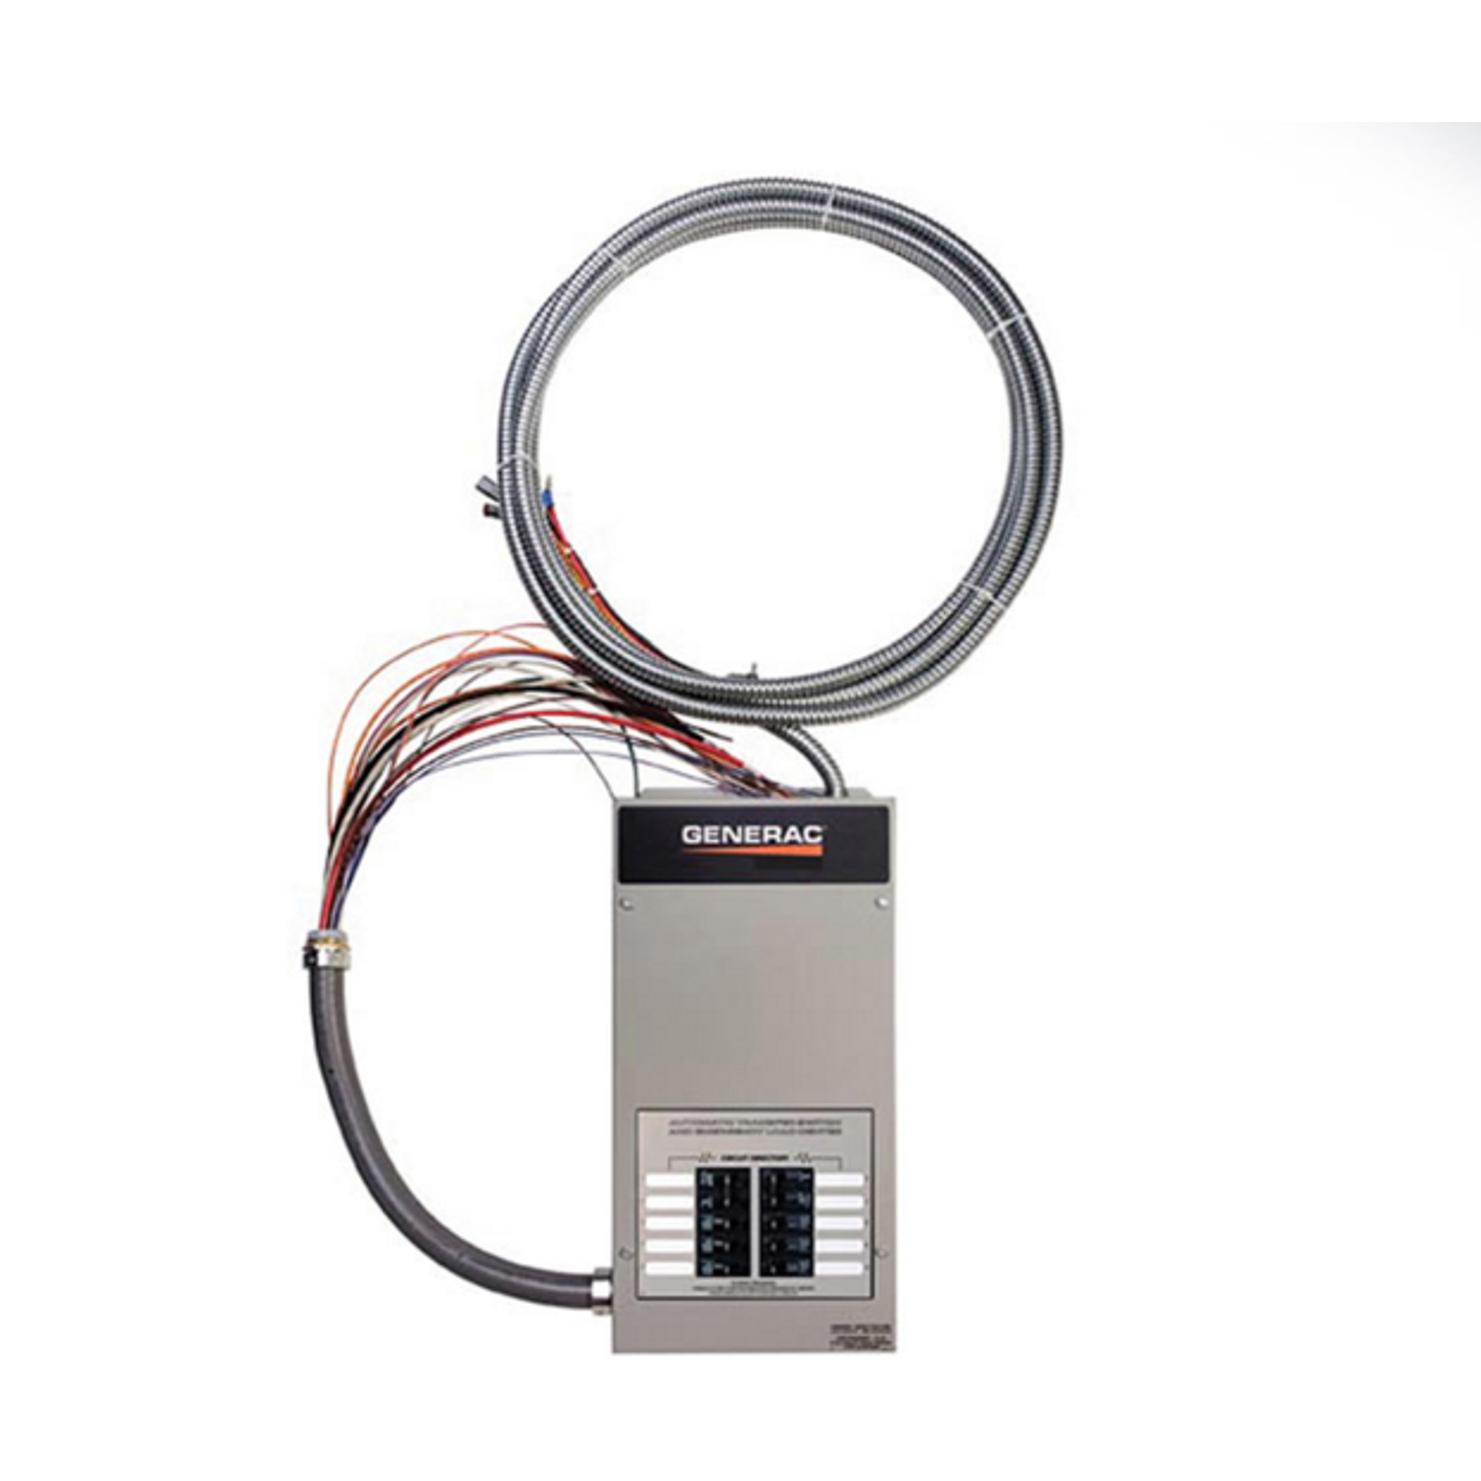 Generac Transfer Switch RTG10EZA1